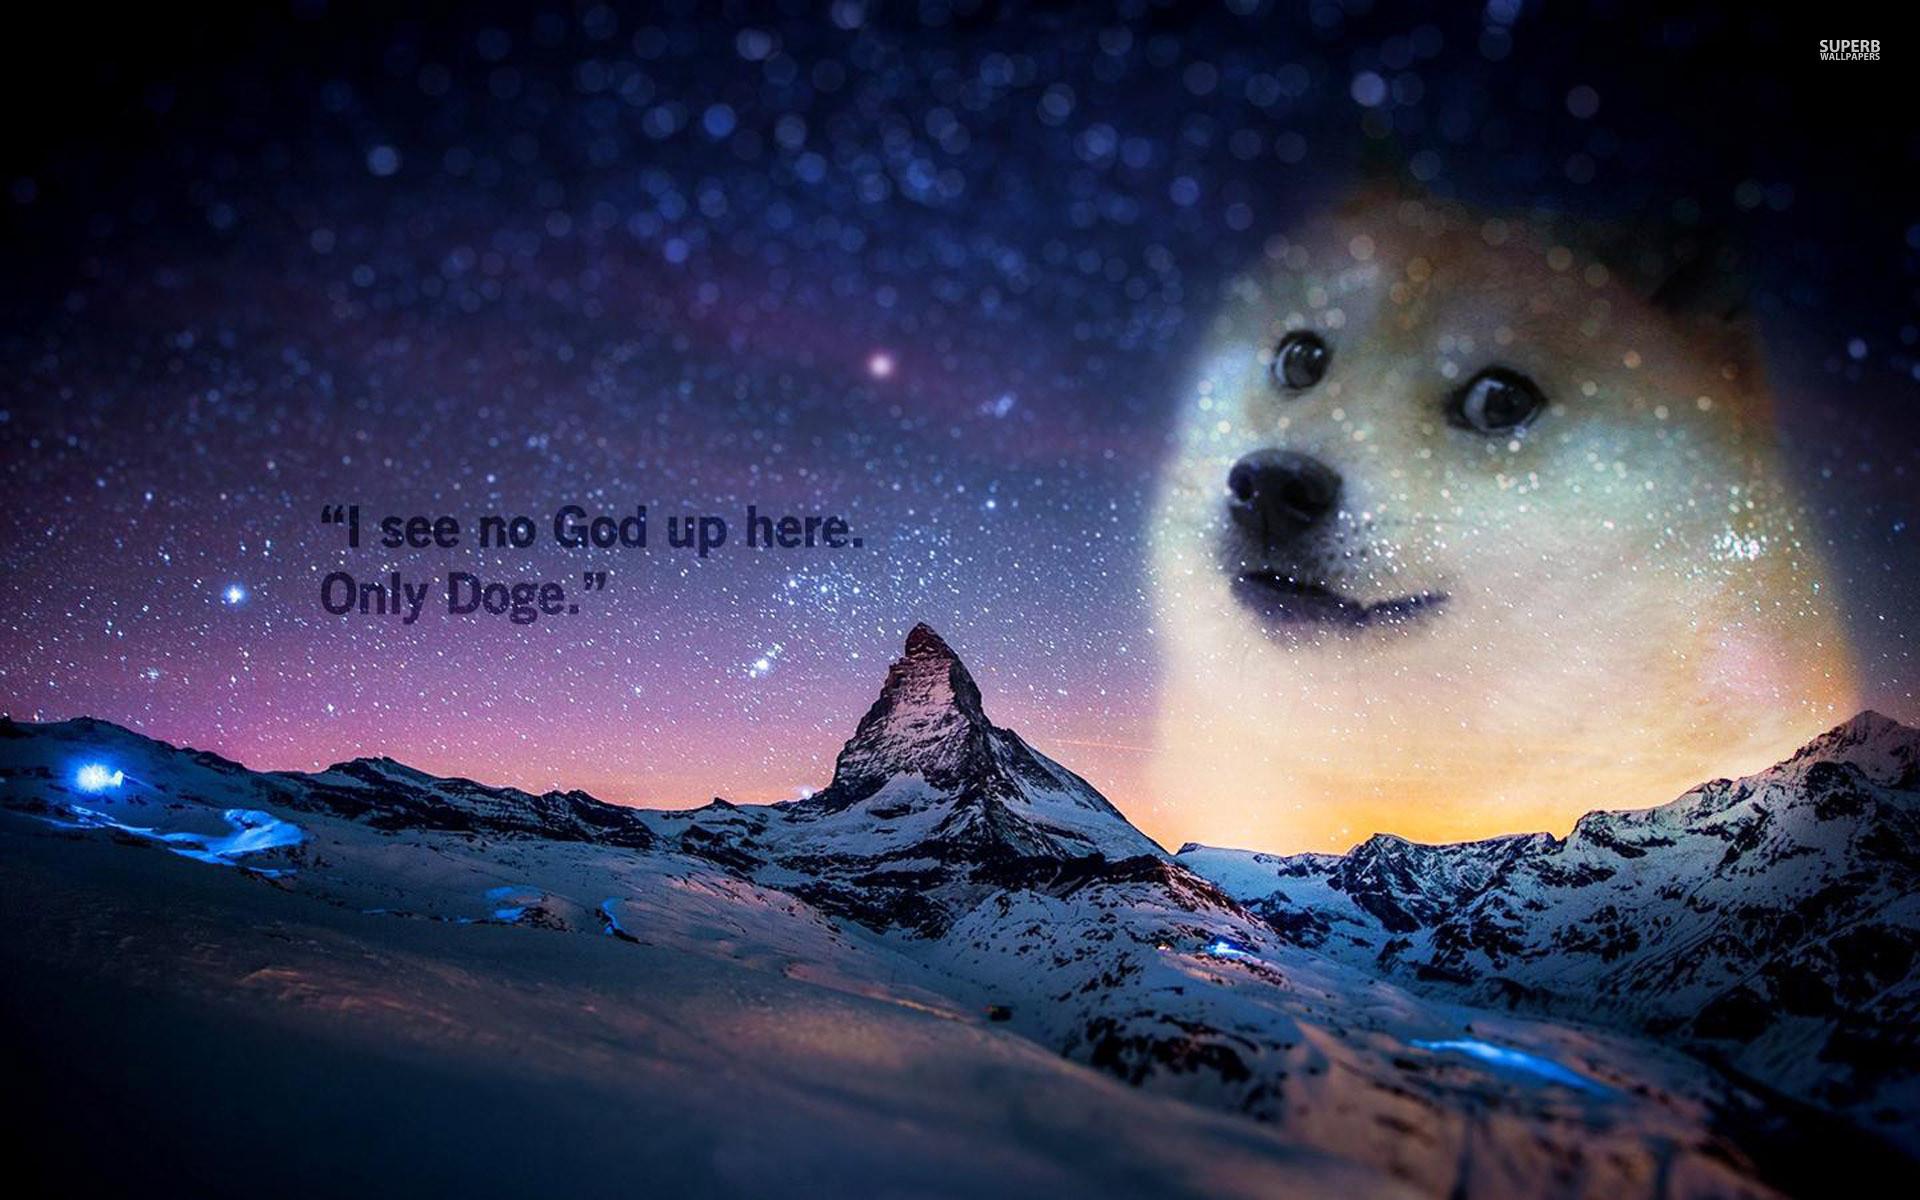 doge wallpaper – Google Search